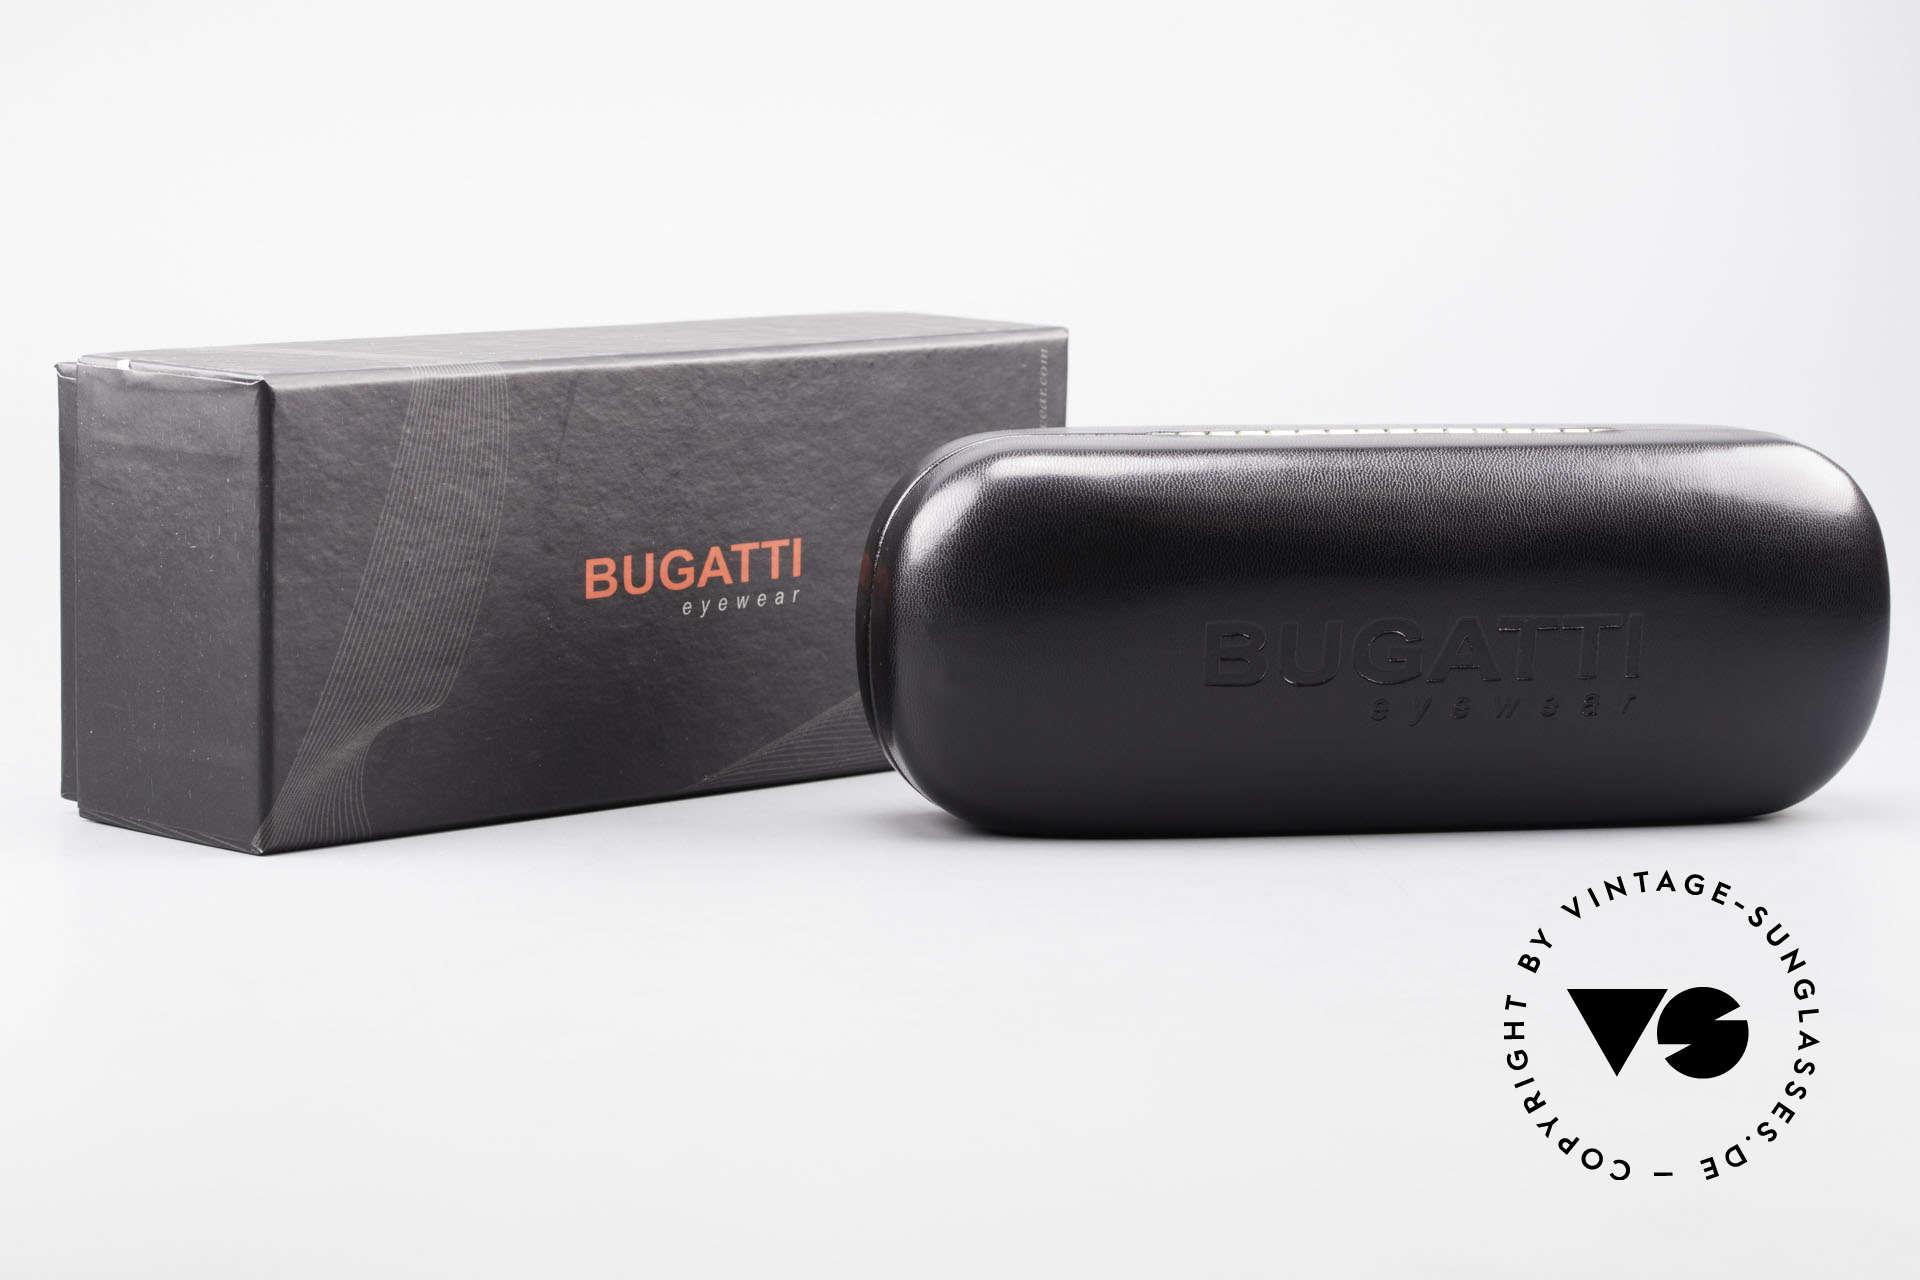 Bugatti 489 Sporty Designer Eyeglasses, Size: medium, Made for Men